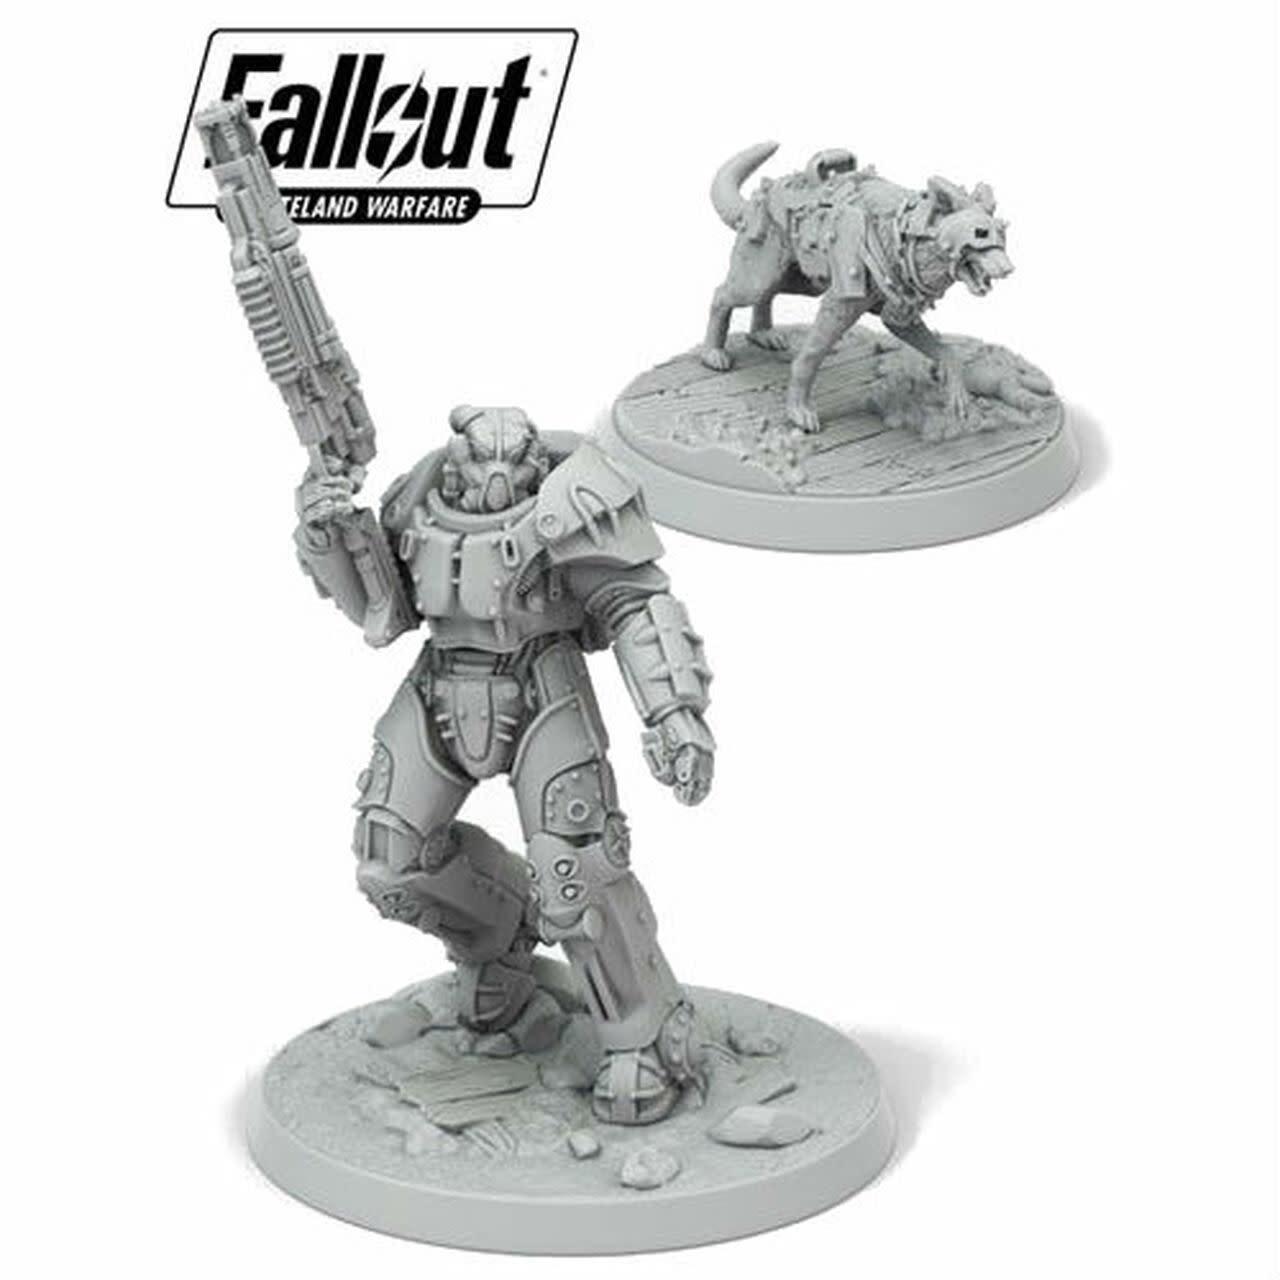 Modiphius Fallout Wasteland Warfare: Survivors- X-01 Survivor & Dogmeat